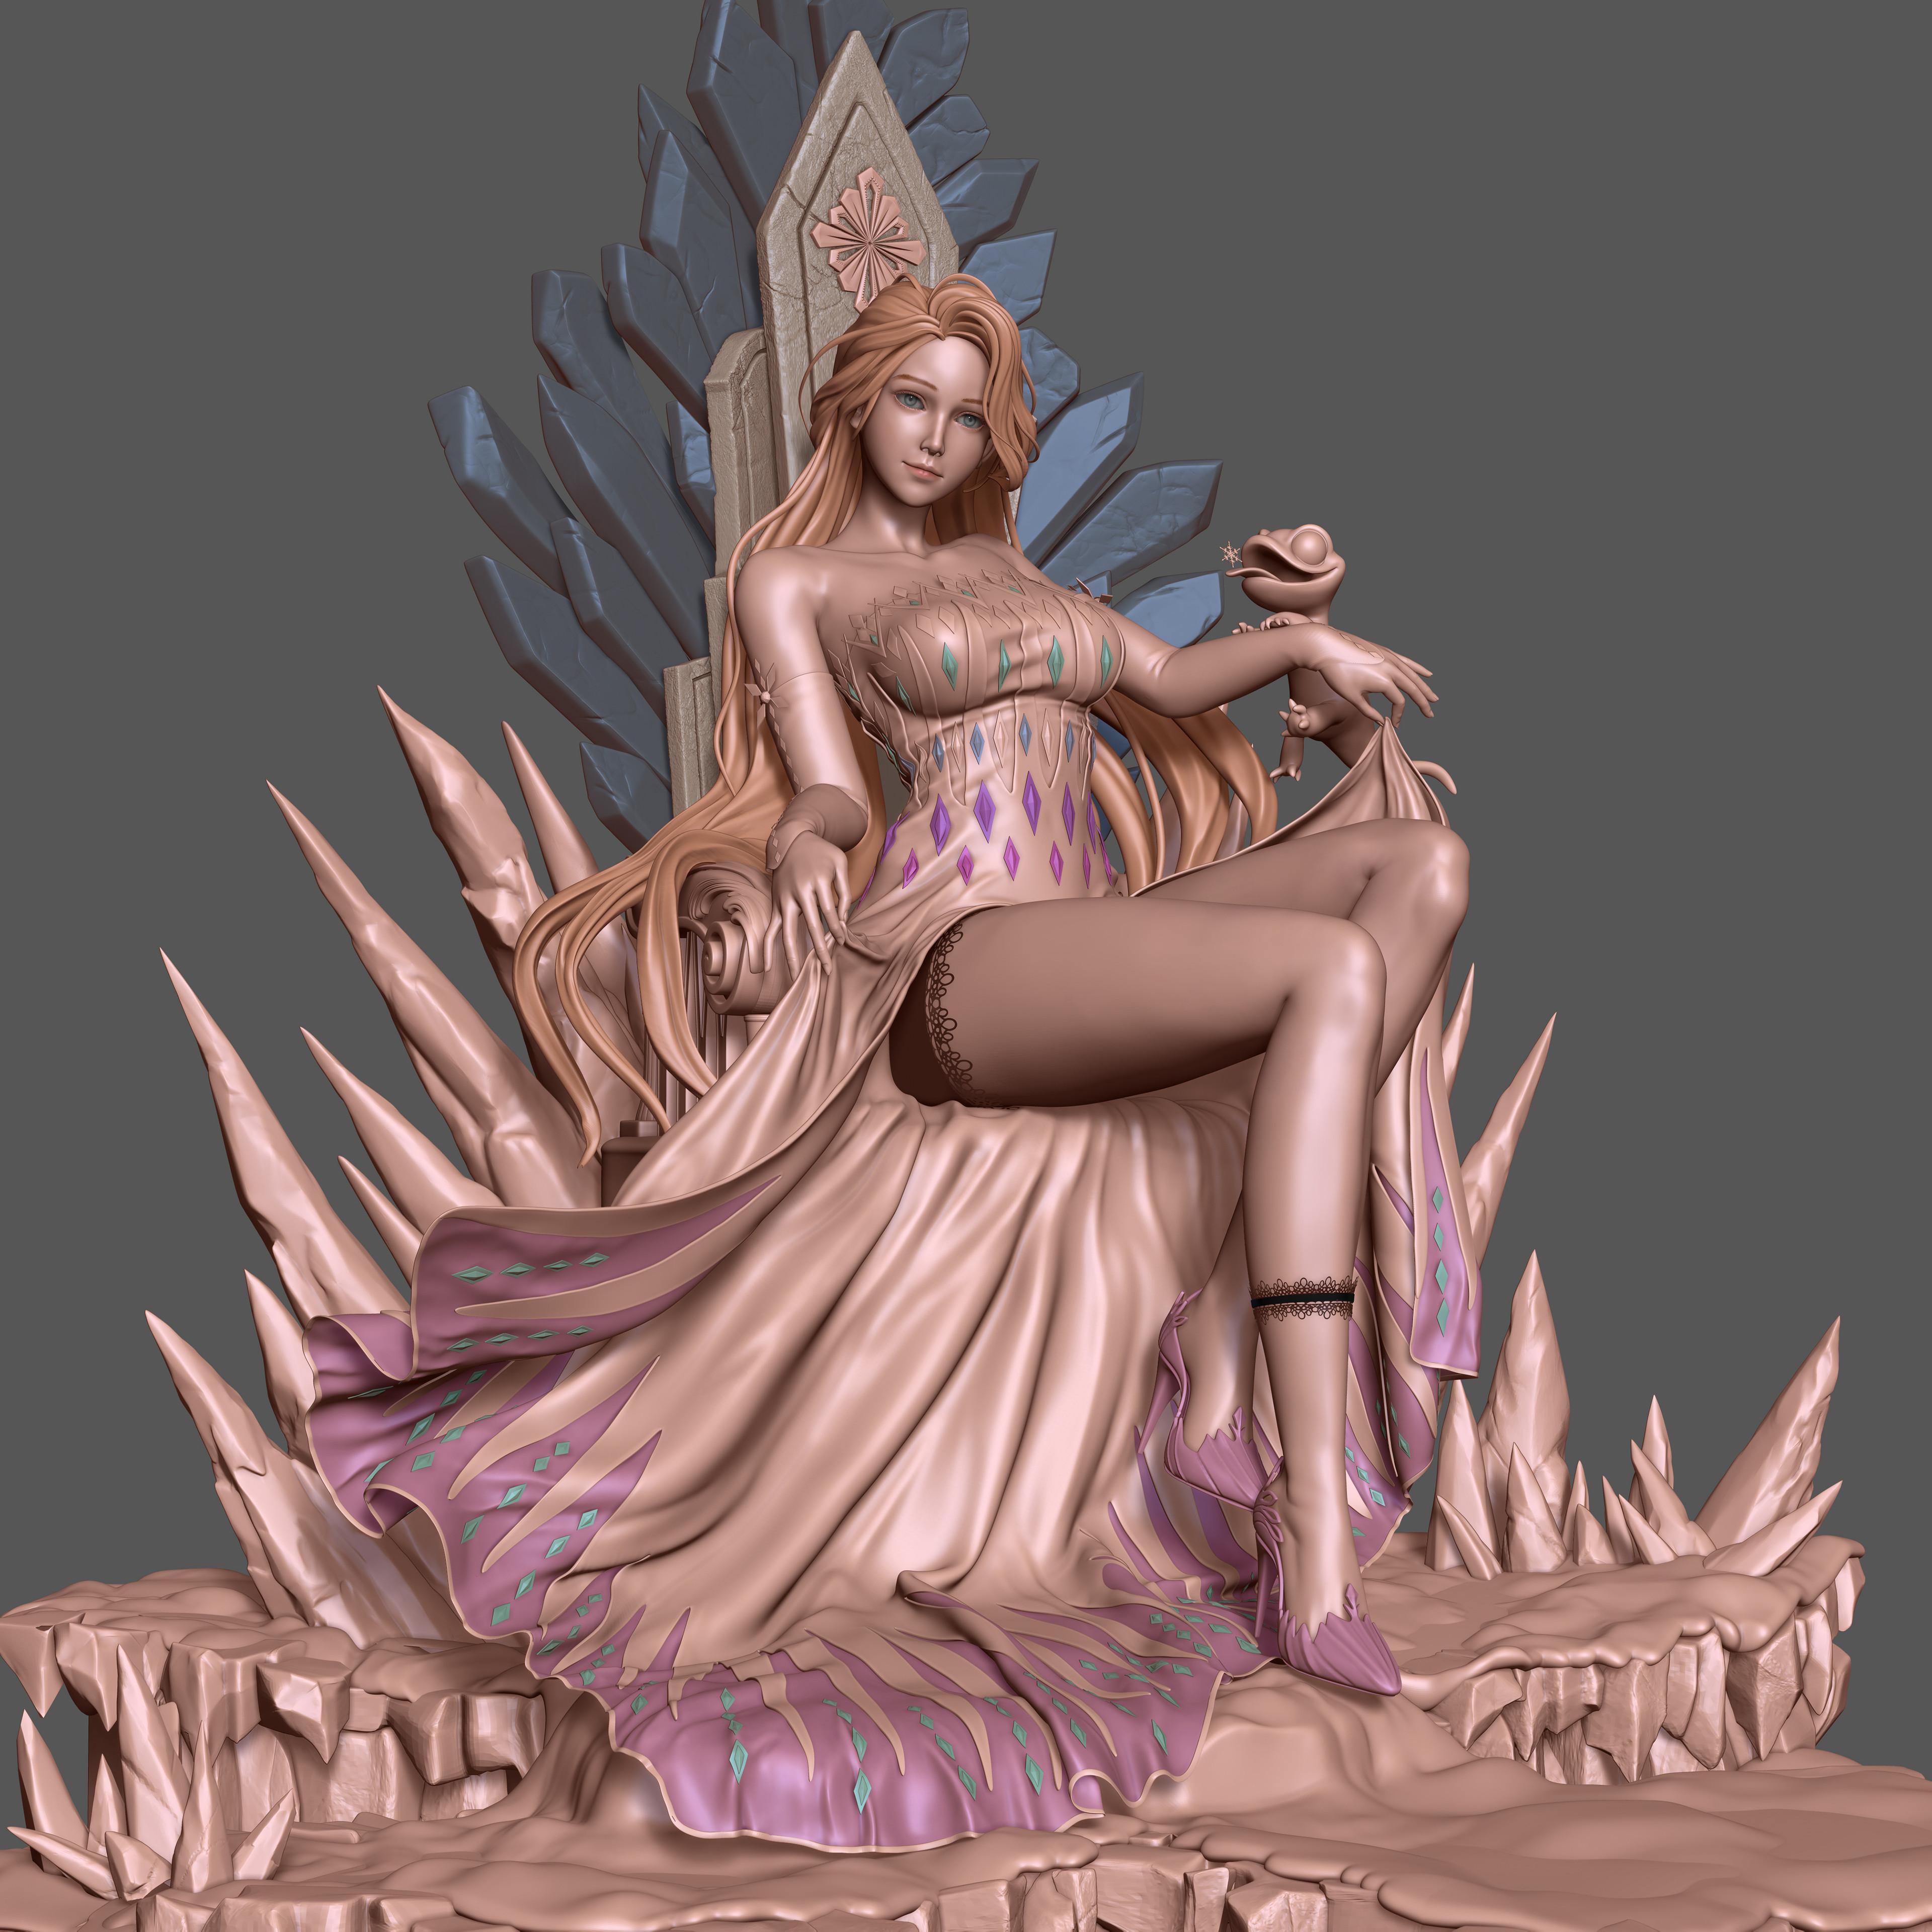 General 3840x3840 Cifangyi CGI women long hair dress purple throne shoes pink high heels blue eyes legs lace garter simple background spikes